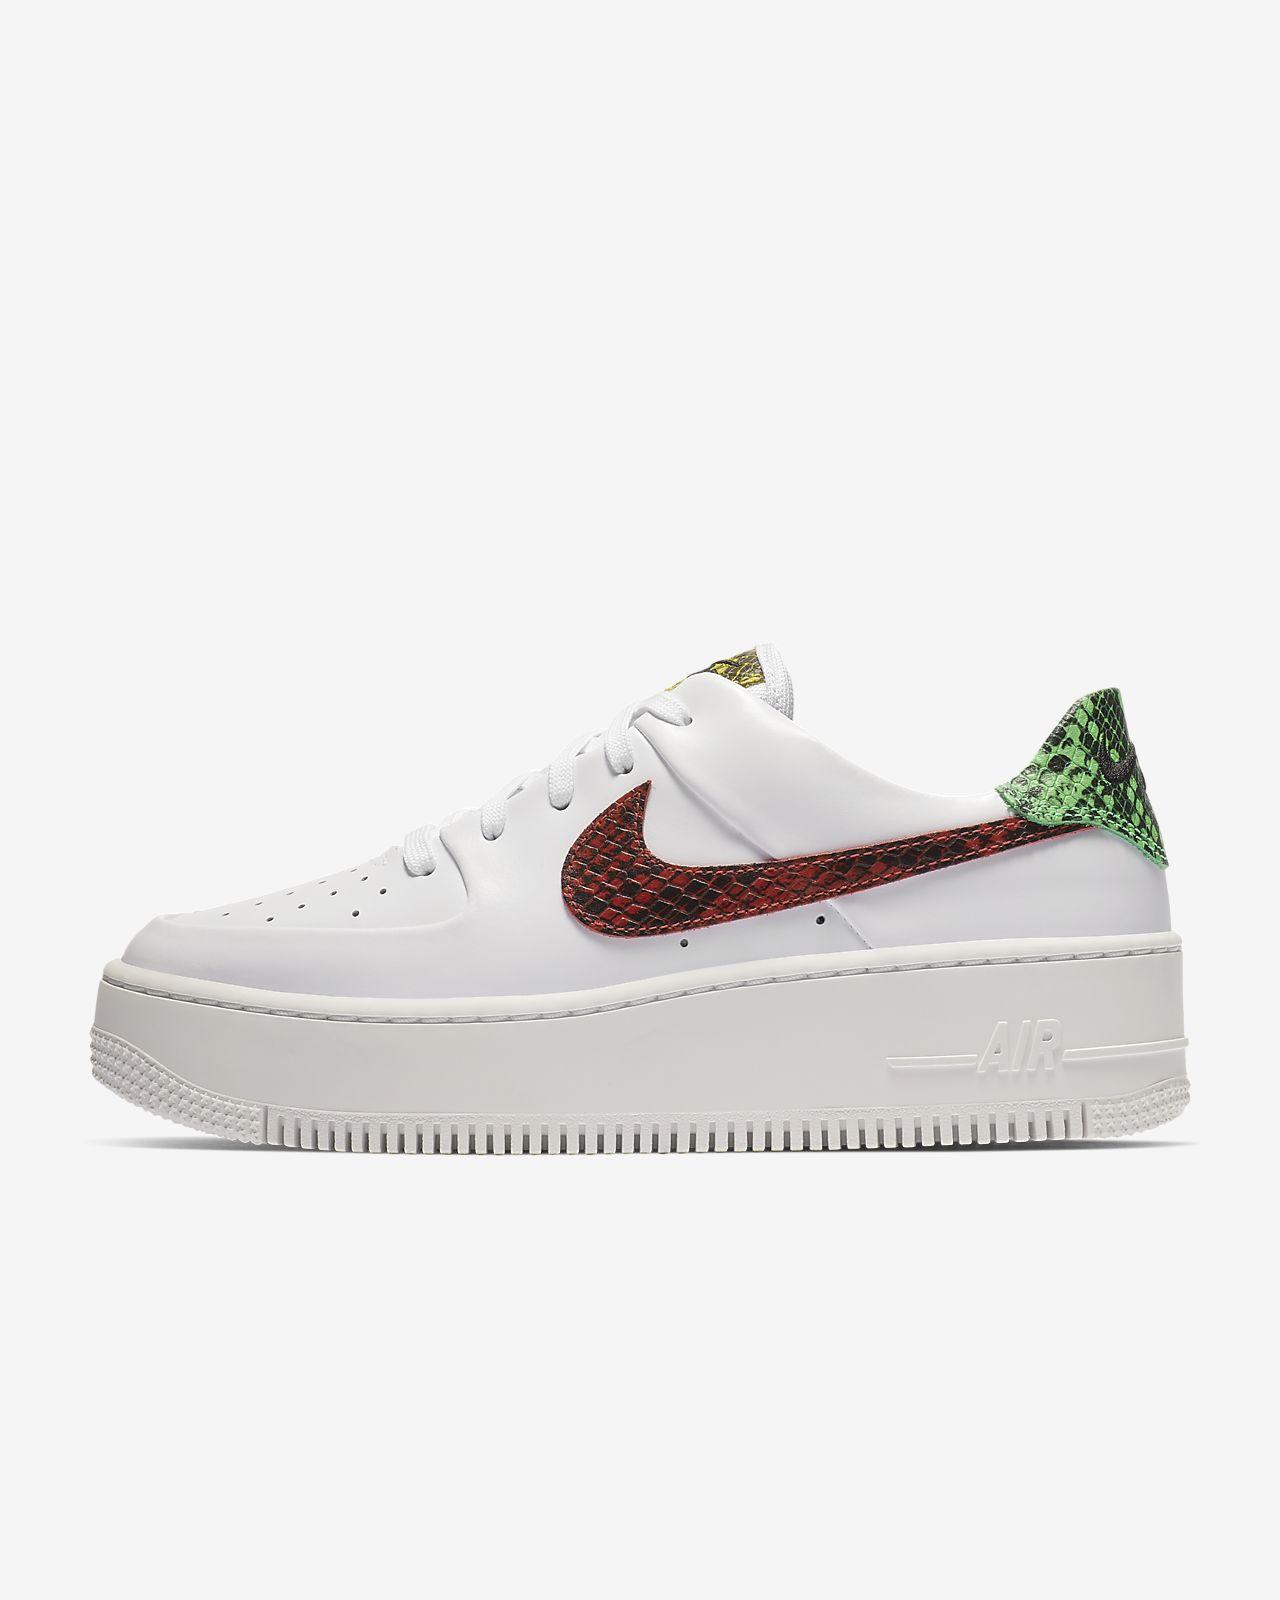 new style 5197b 7be0f ... Sko Nike Air Force 1 Sage Low Premium Animal för kvinnor